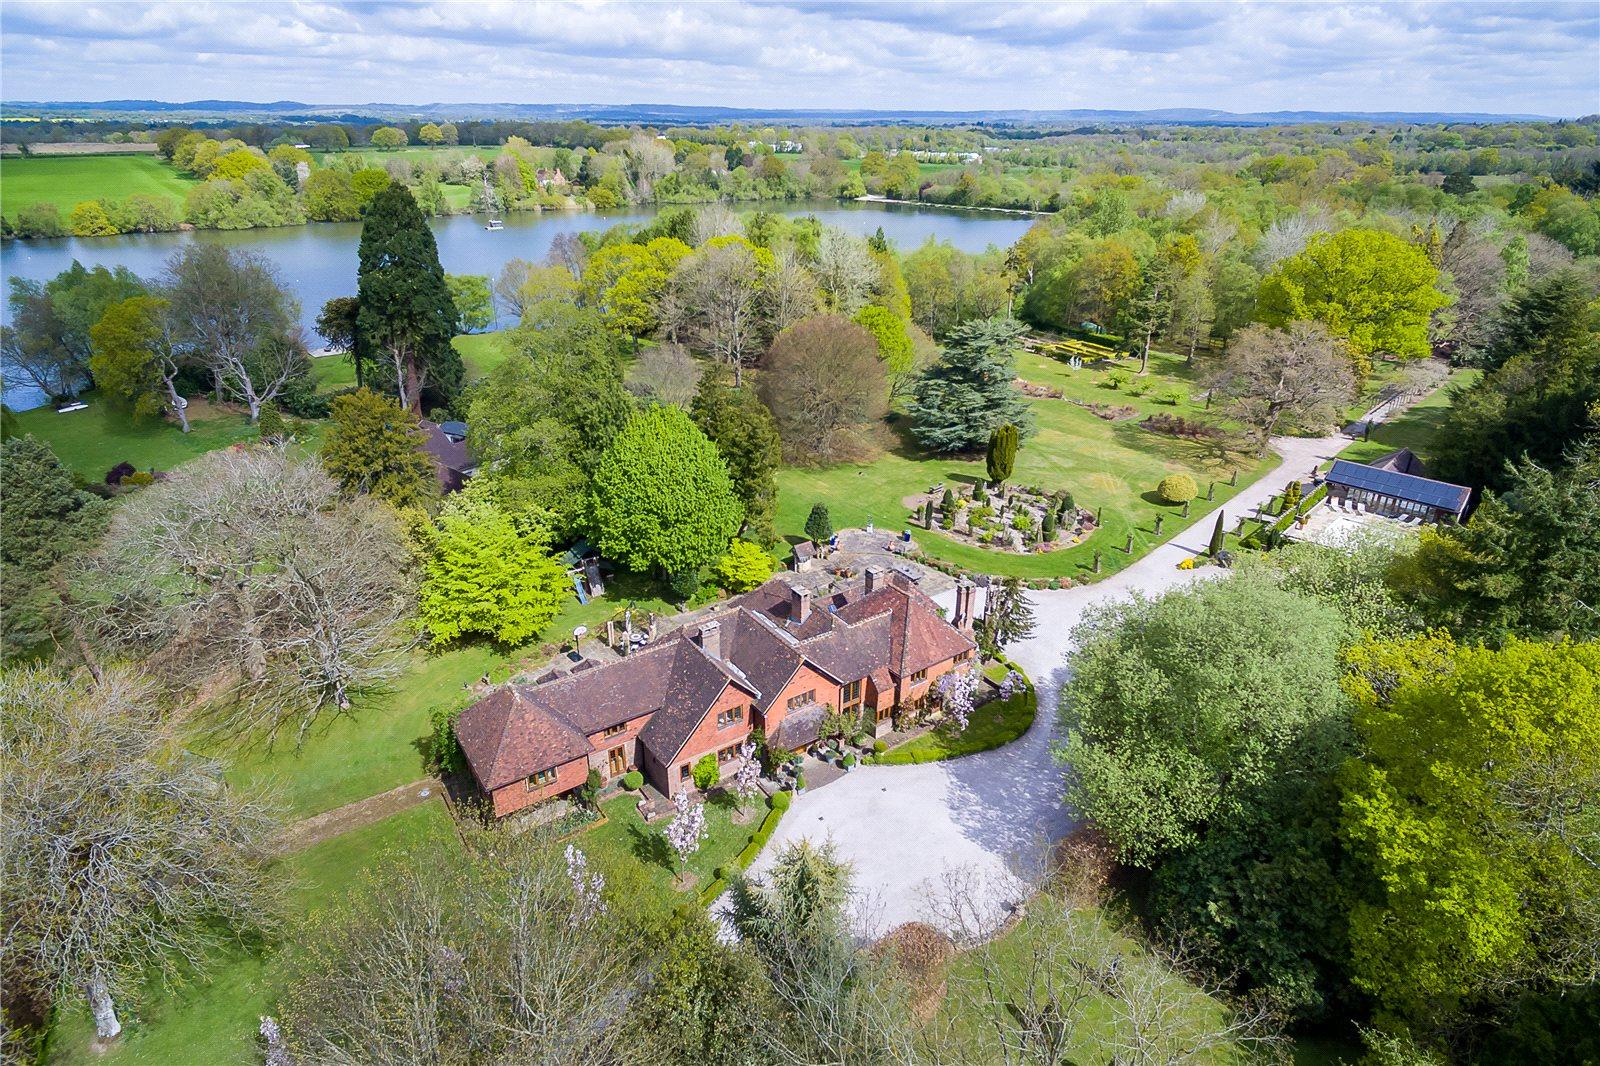 Single Family Home for Sale at Copthorne Road, Felbridge, Surrey, RH19 Surrey, England